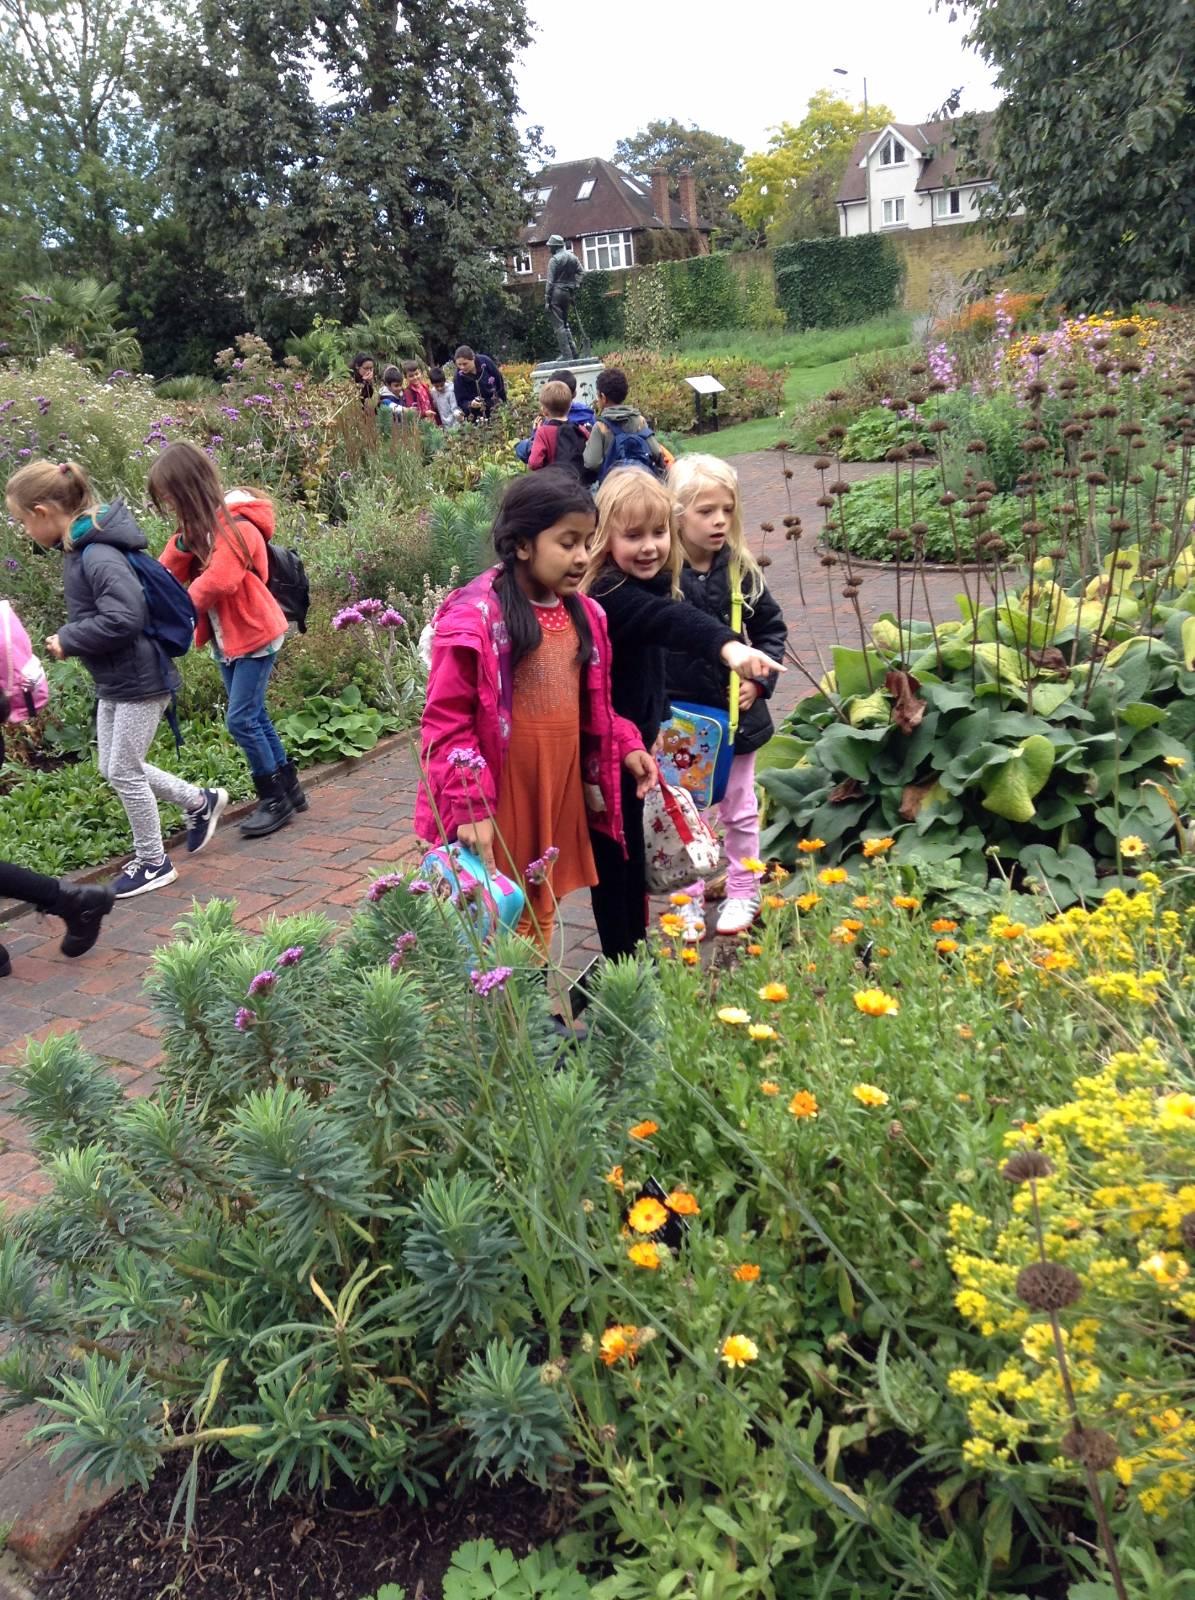 Kew Gardens Phone No: Primrose Hill Primary School